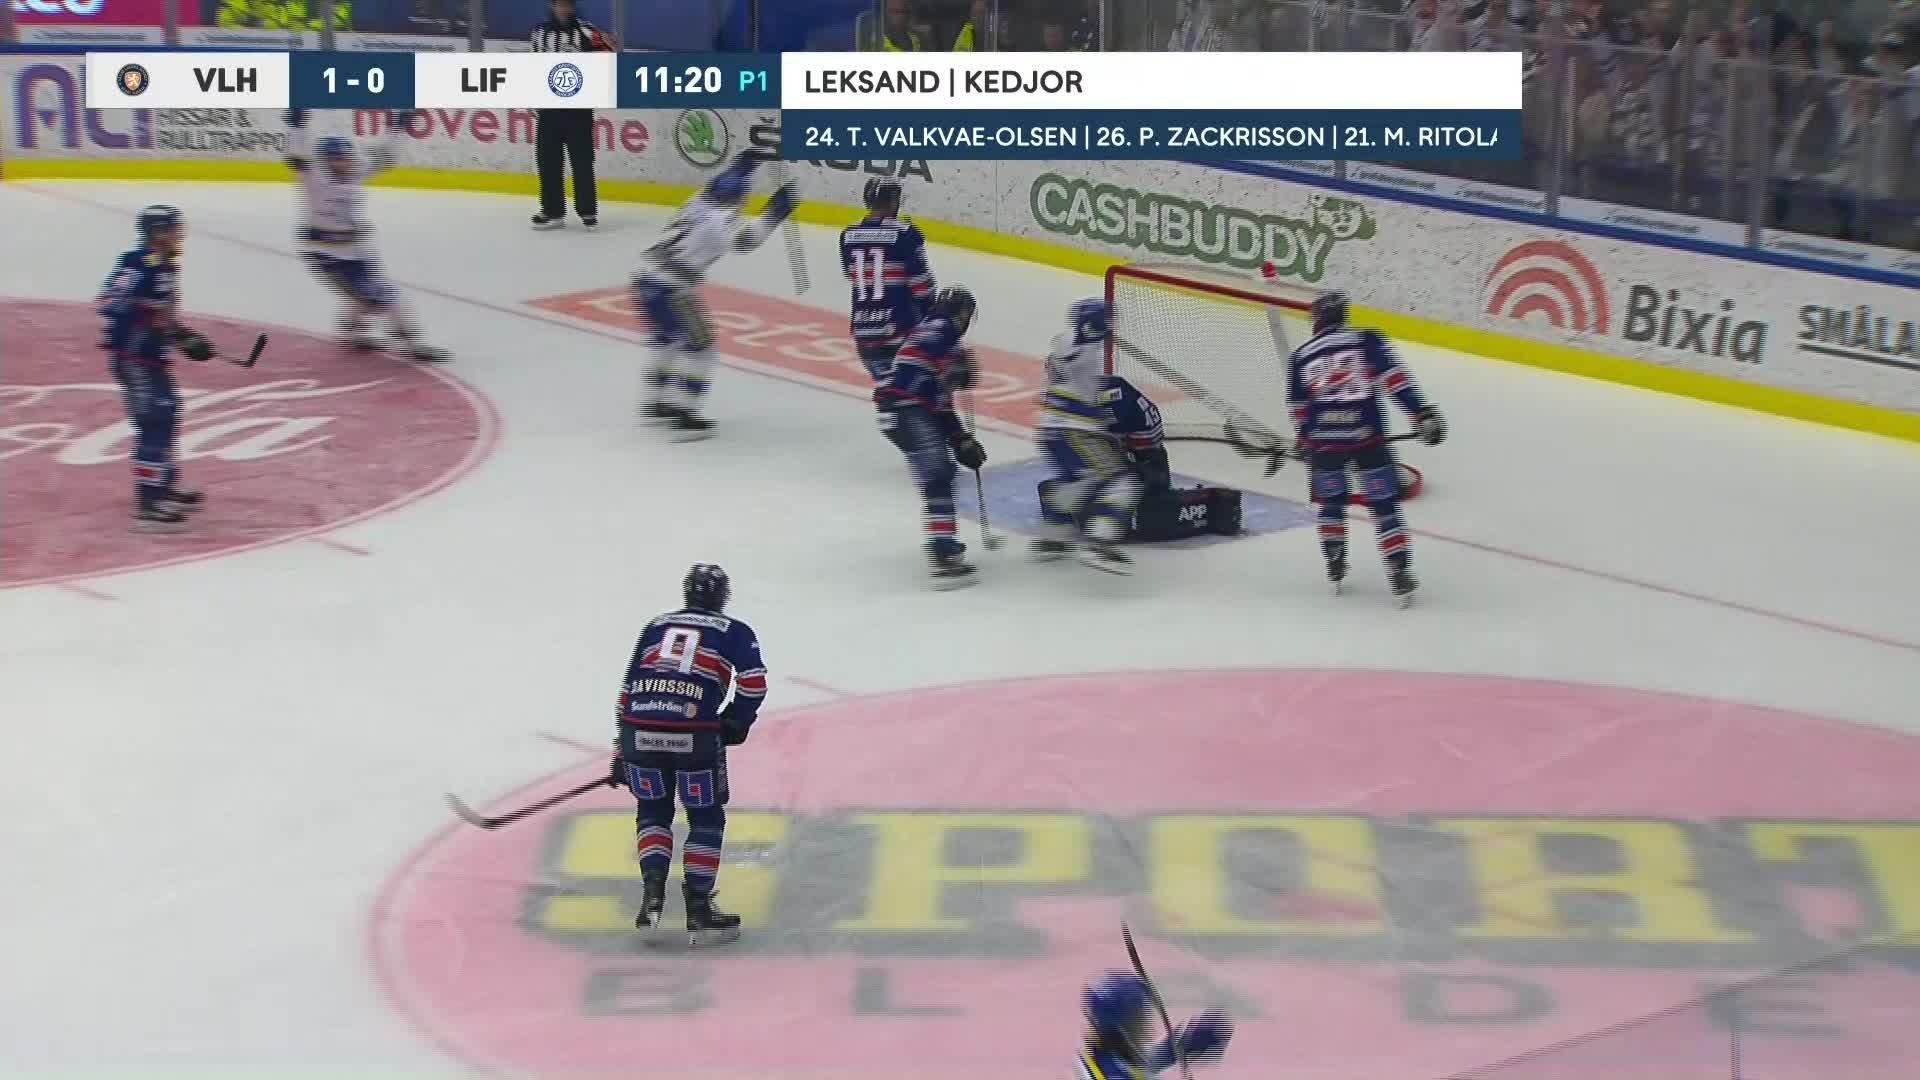 Växjö Lakers - Leksands IF 1-1